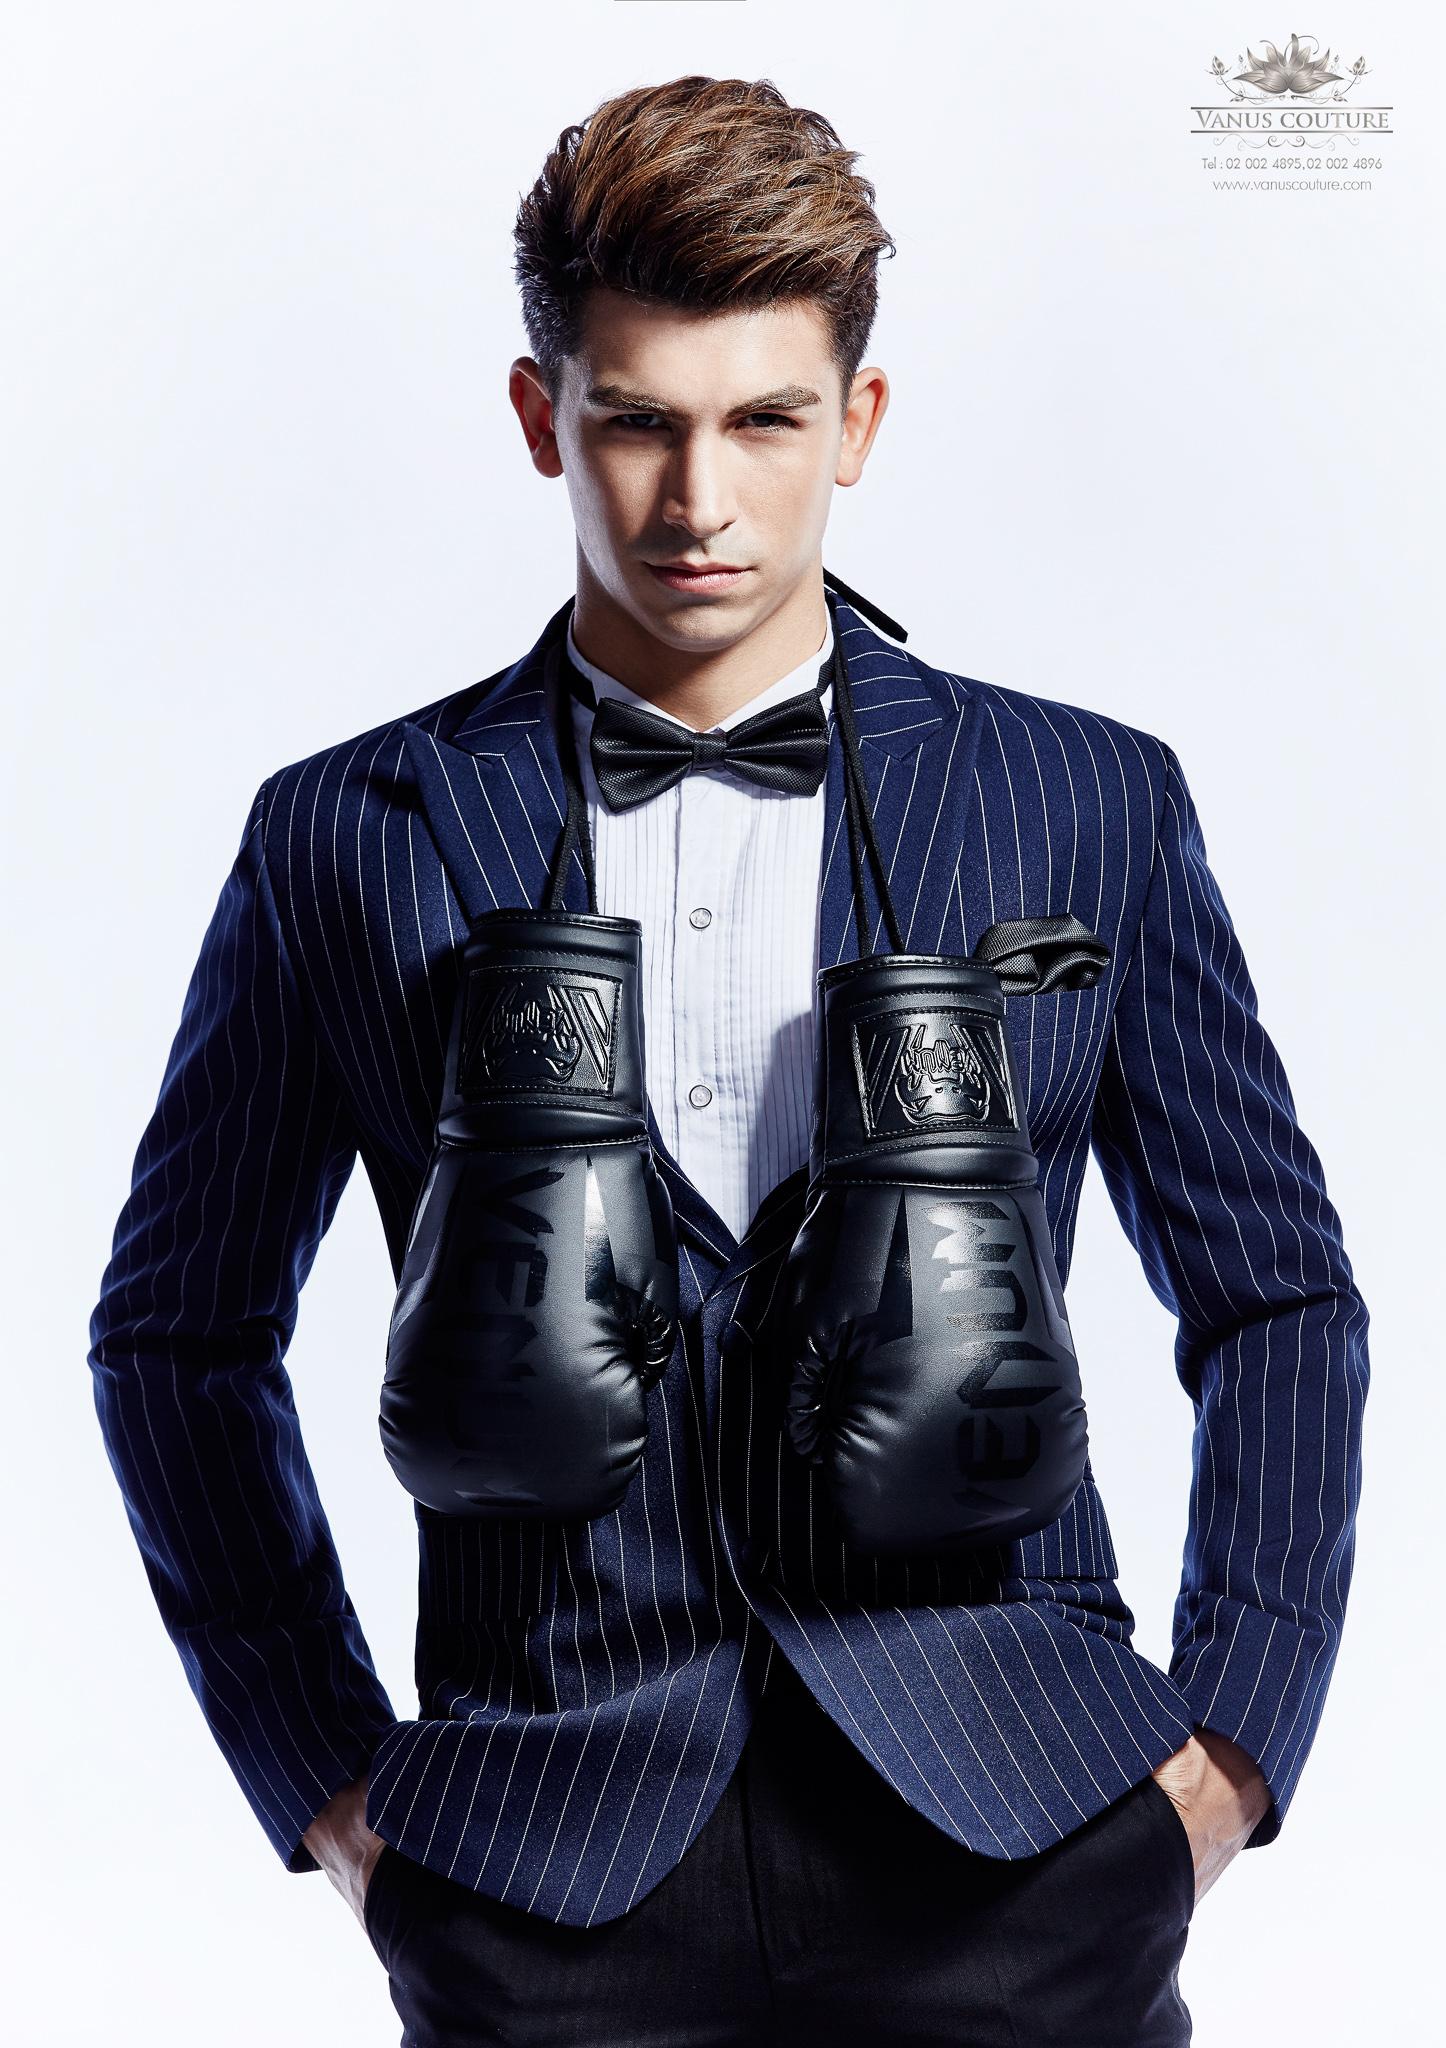 Groom suit - Antoun 02